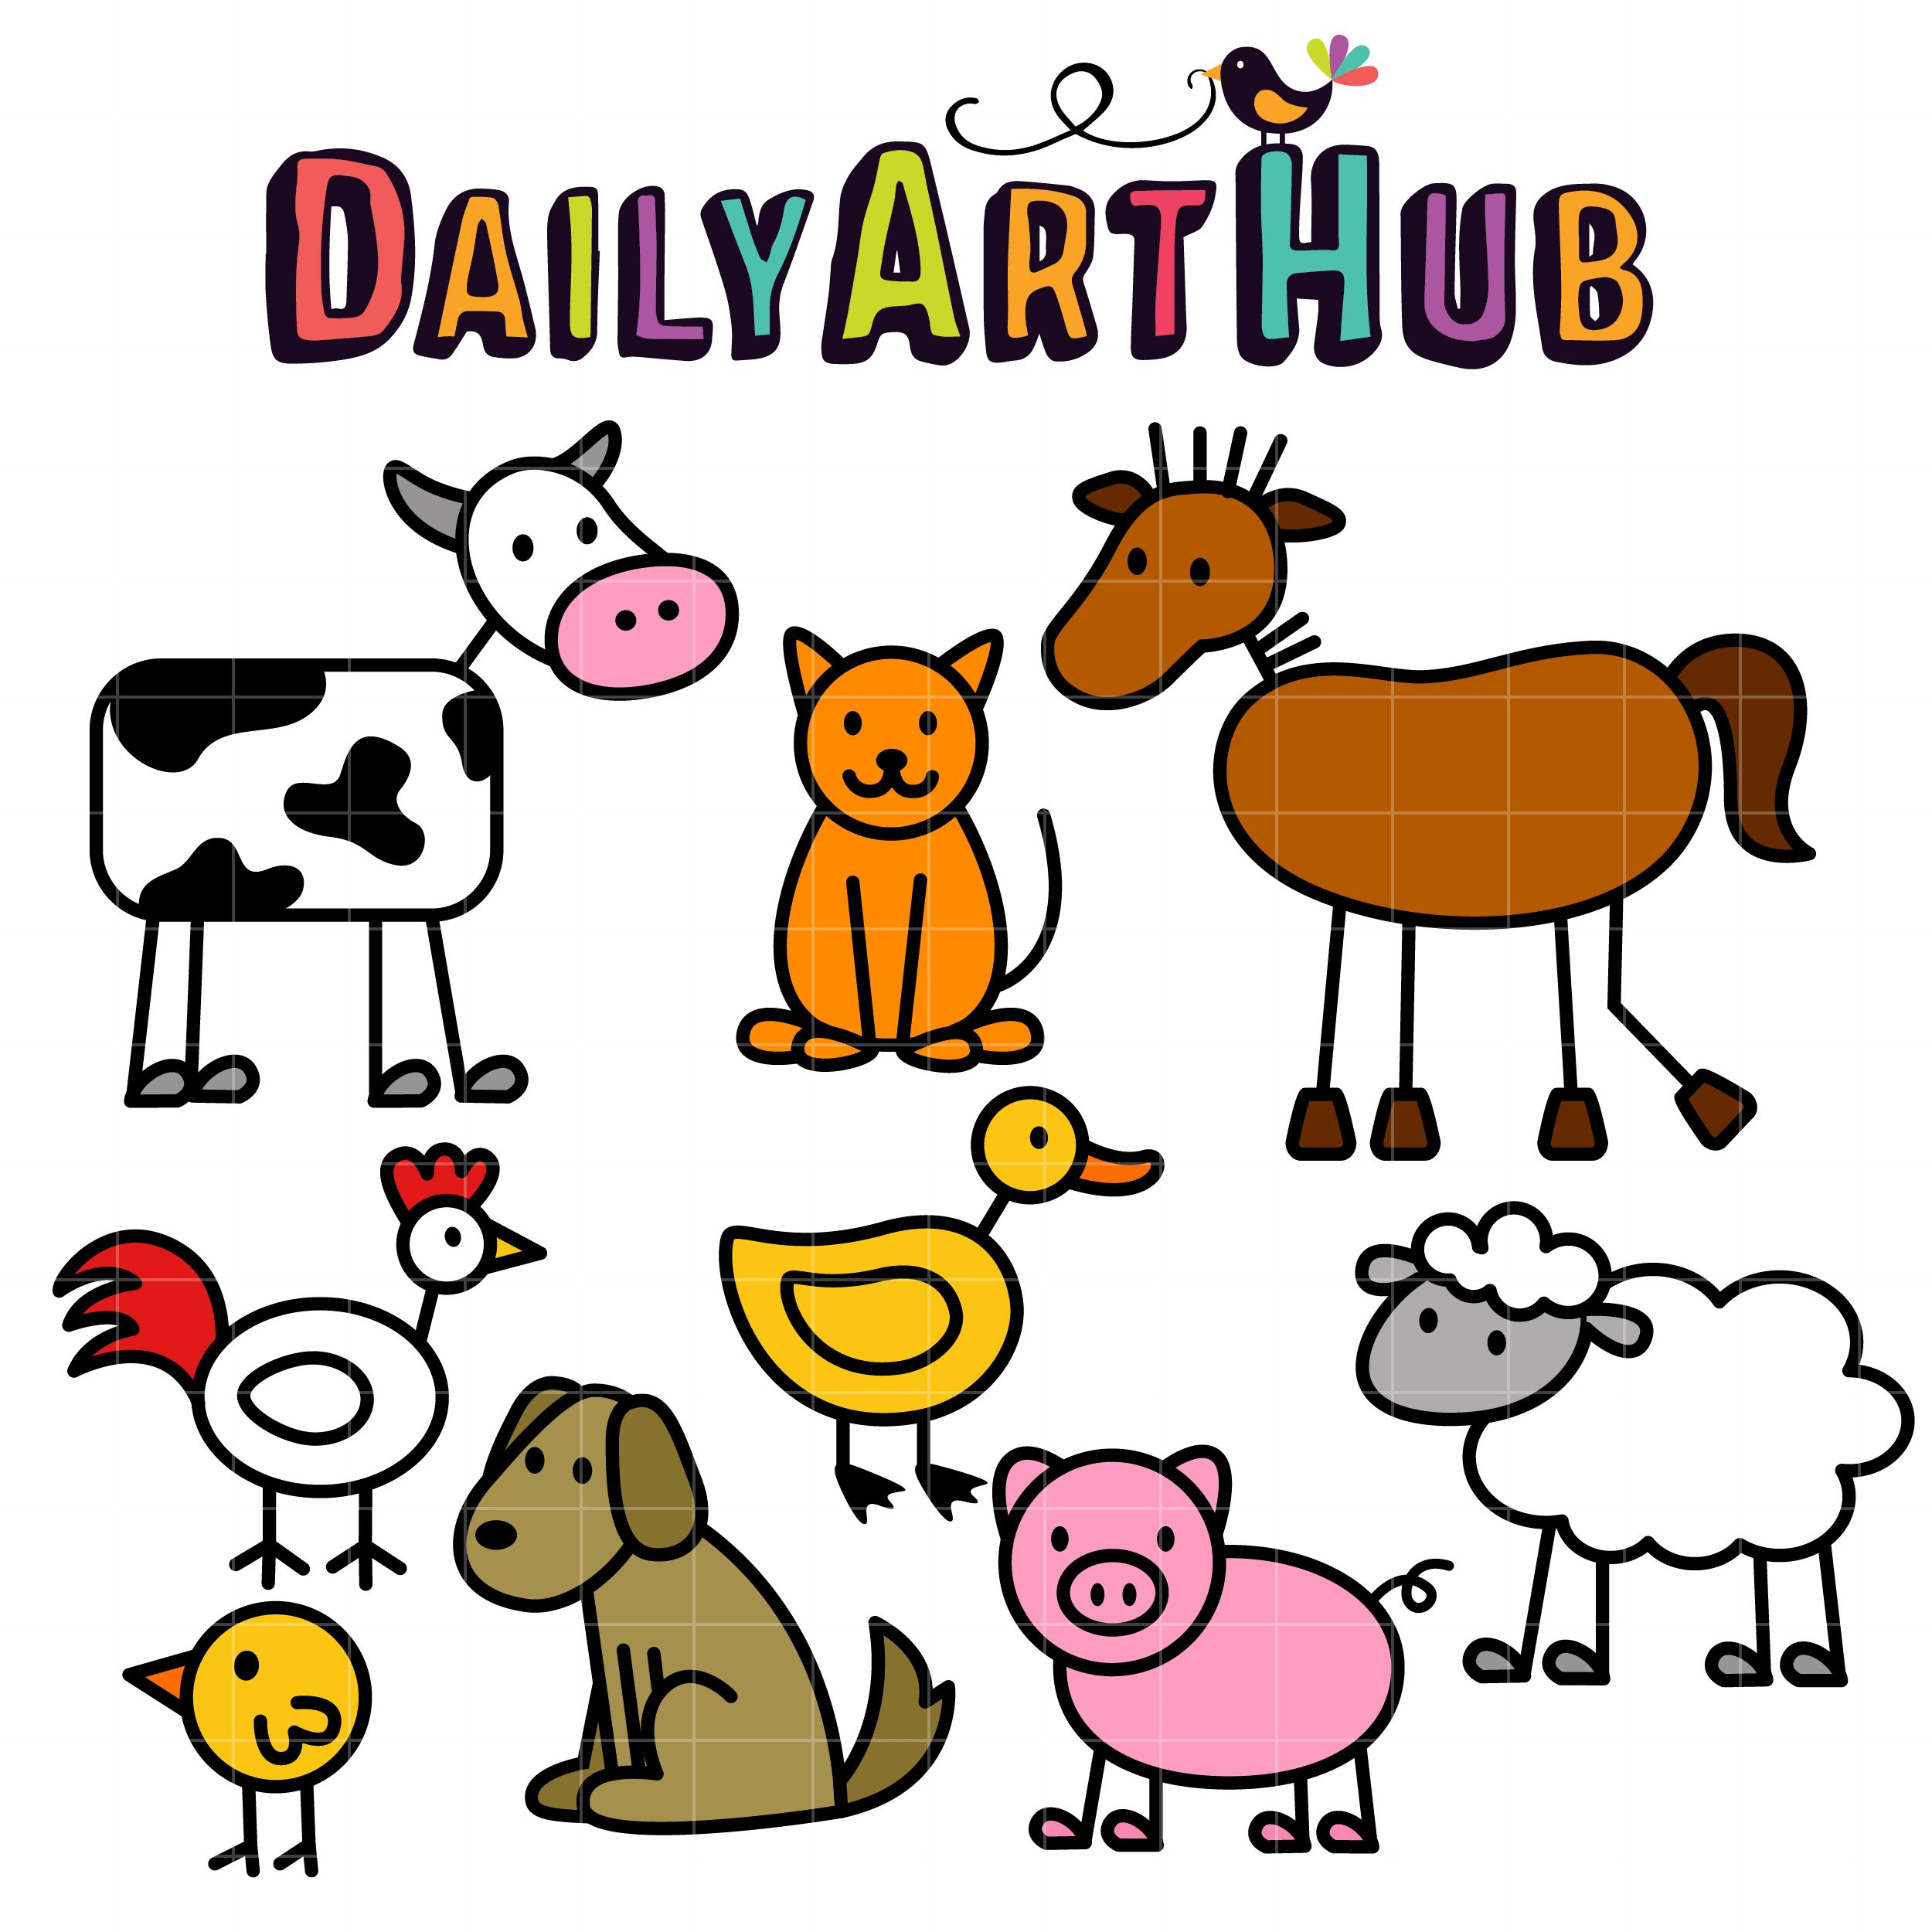 Stick Farm Animals Clip Art Set Daily Art Hub Free Clip Art Everyday Animal Doodles Farm Animal Painting Animal Clipart